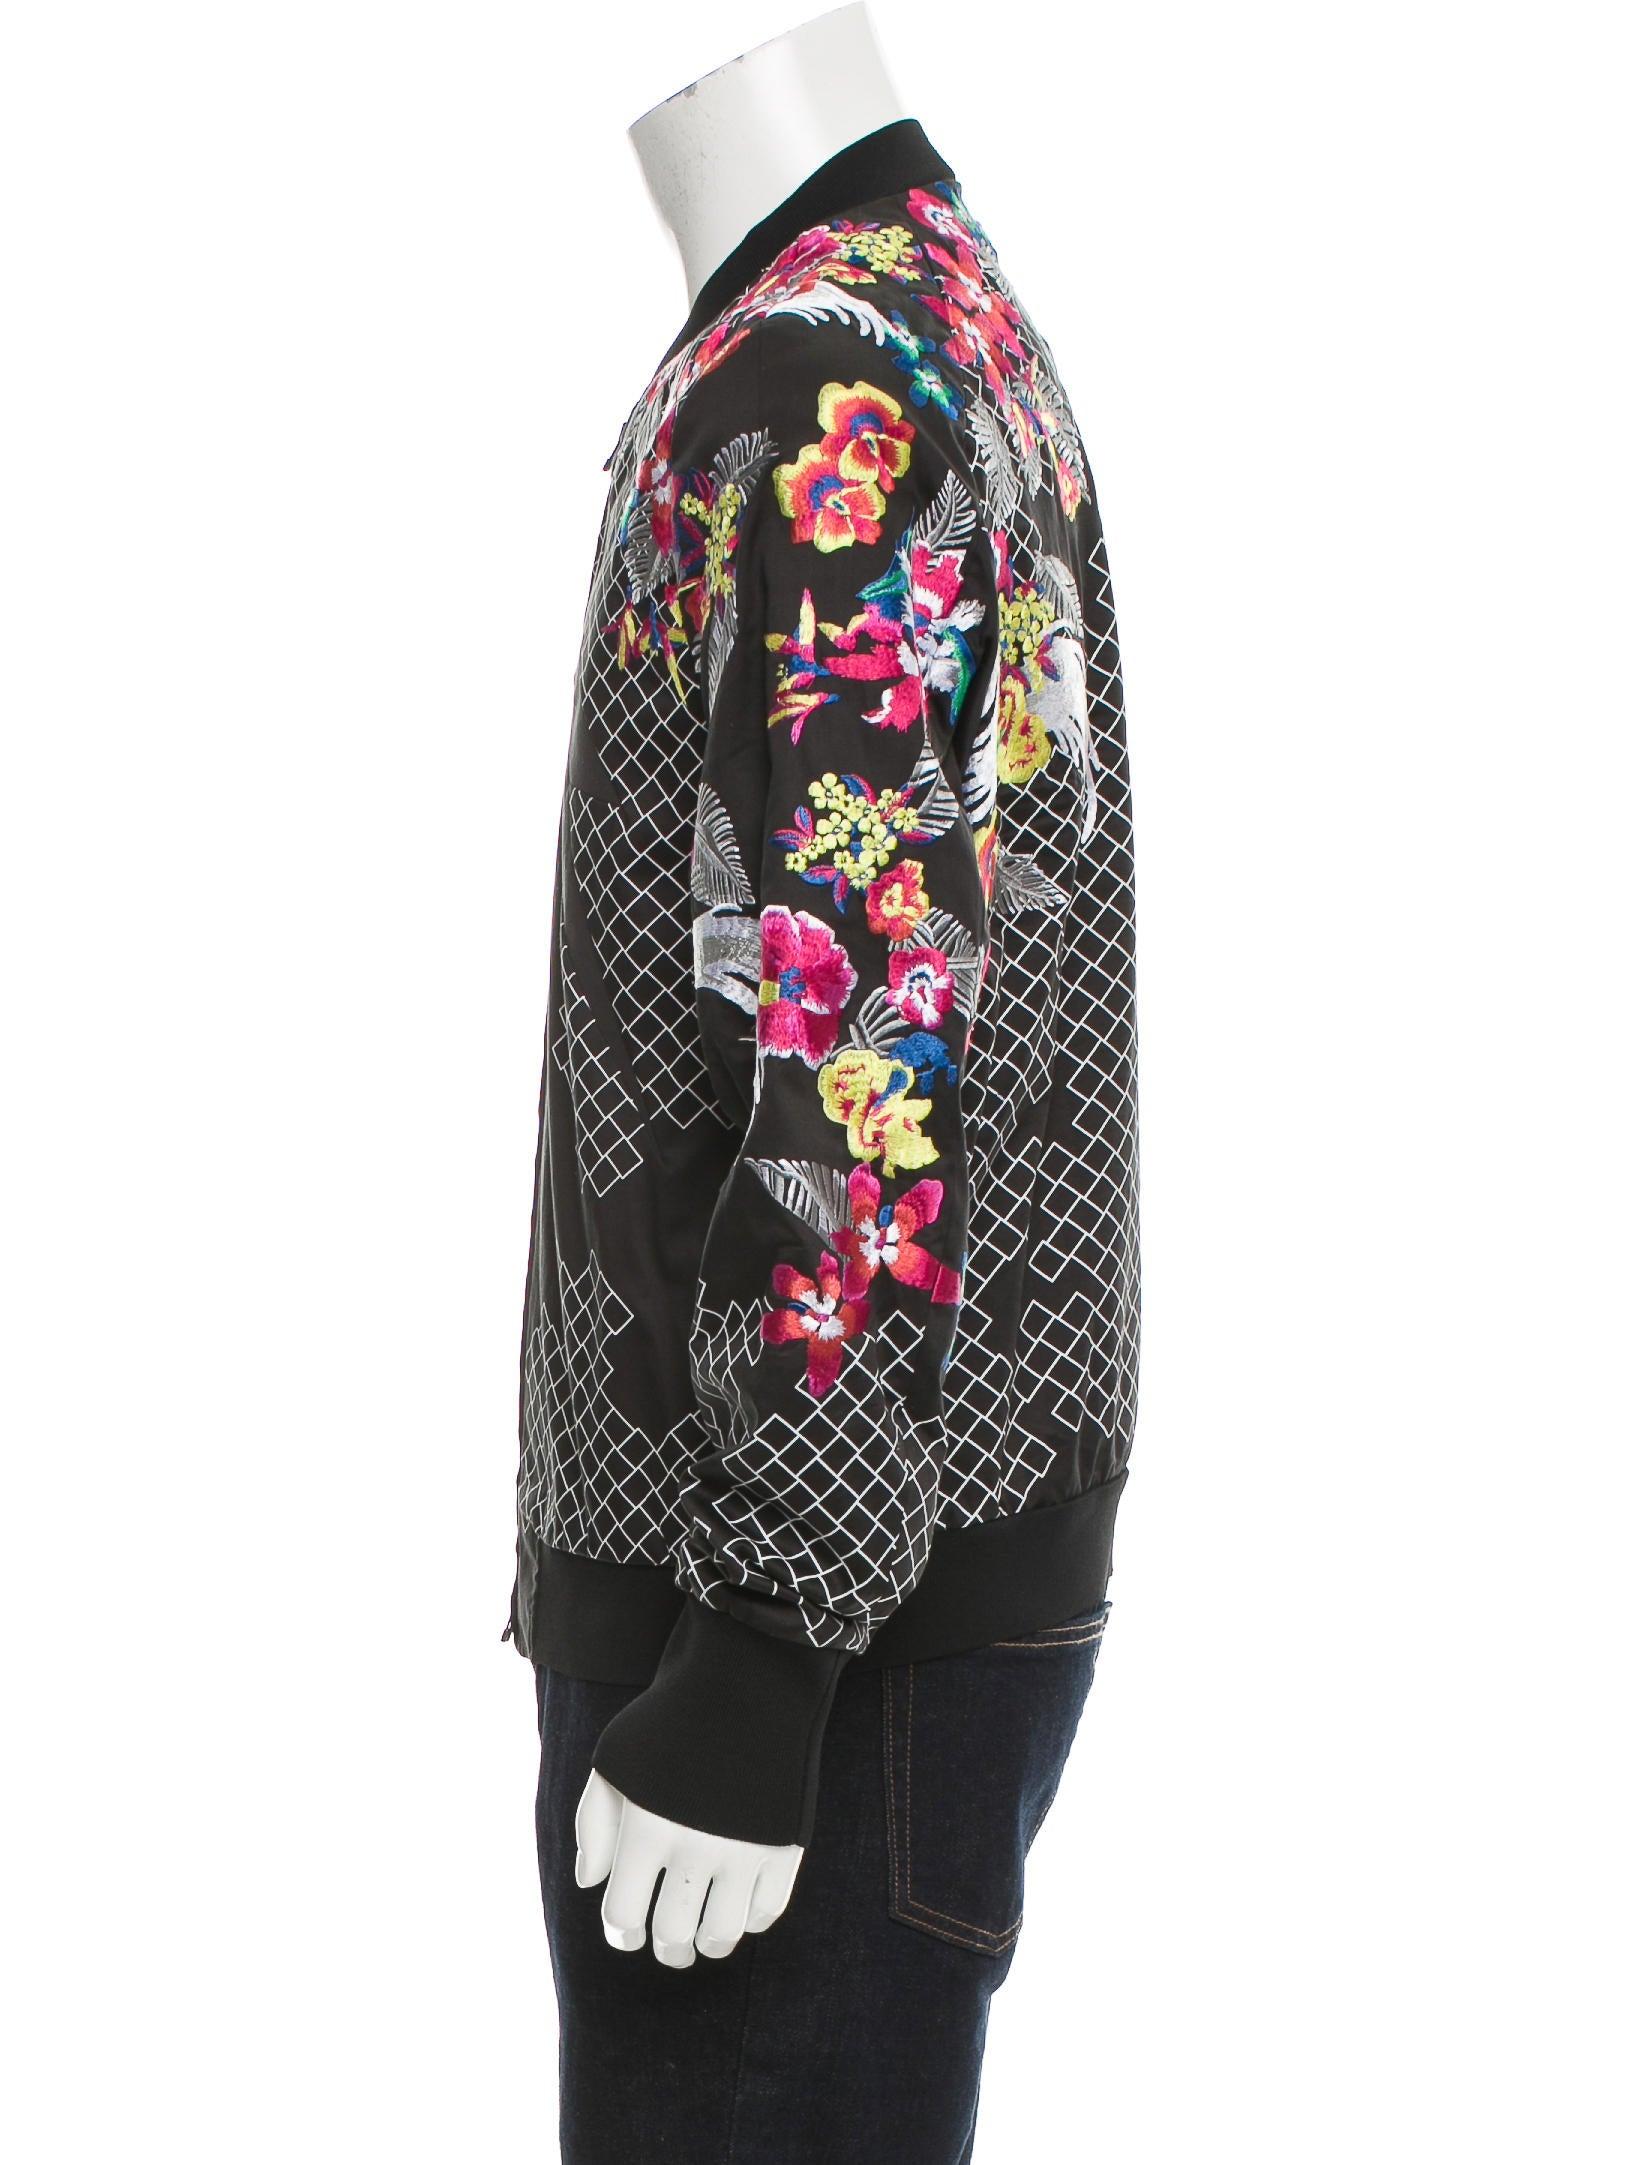 Phillip lim embroidered floral bomber jacket